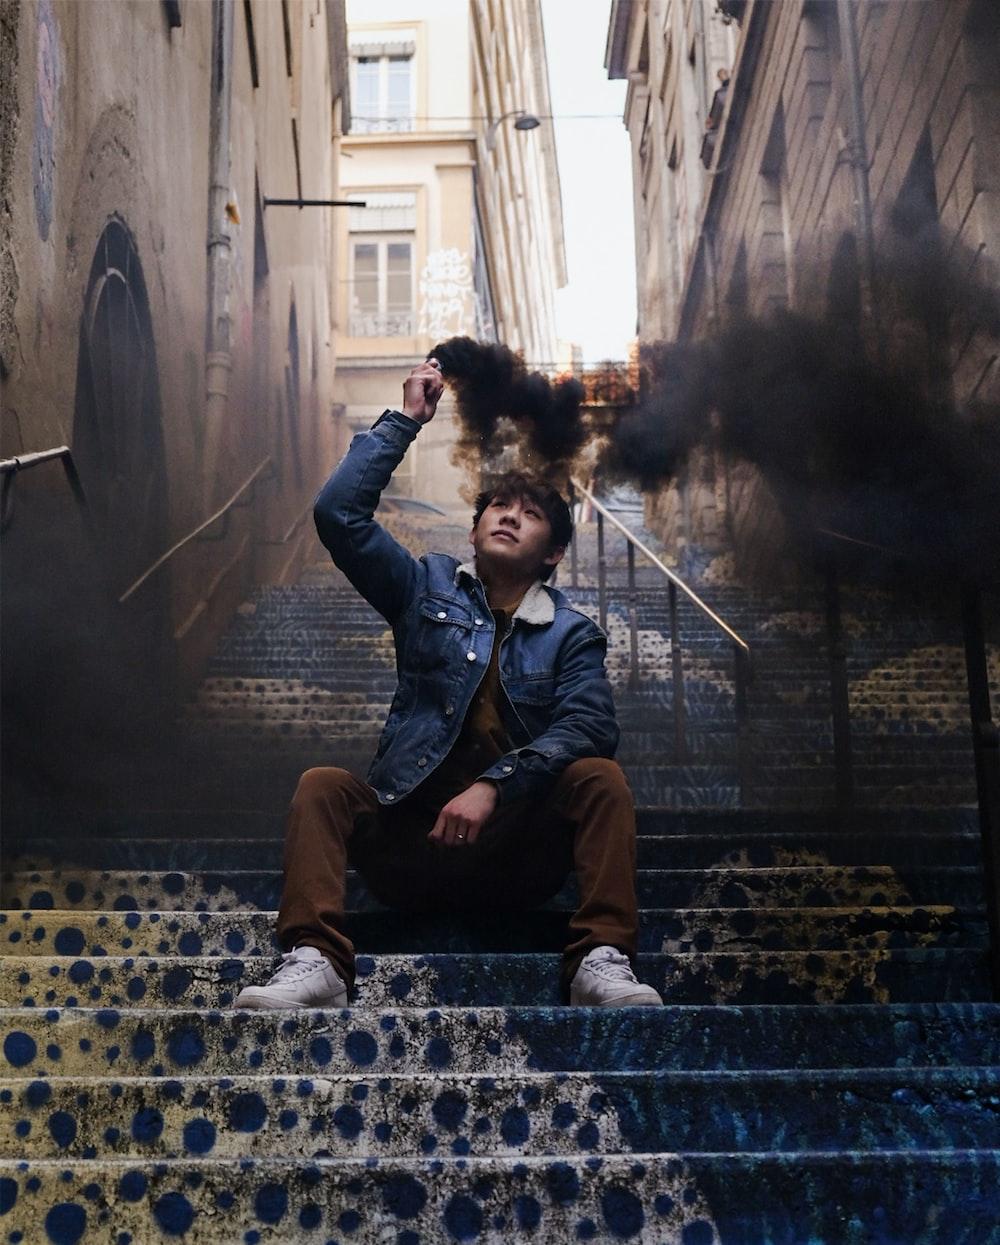 man in blue denim jacket sitting on concrete bench